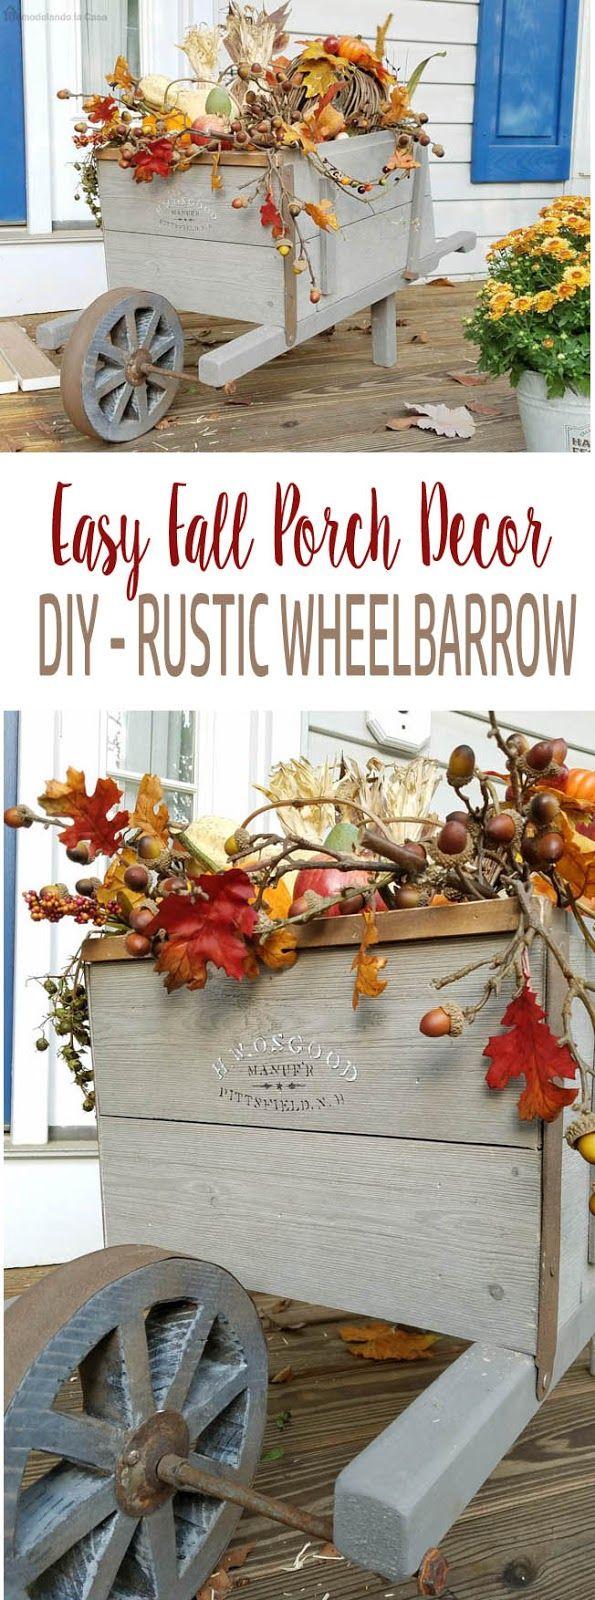 DIY - Rustic Wheelbarrow - #DIHWorkshop  #wheelbarrow #diy